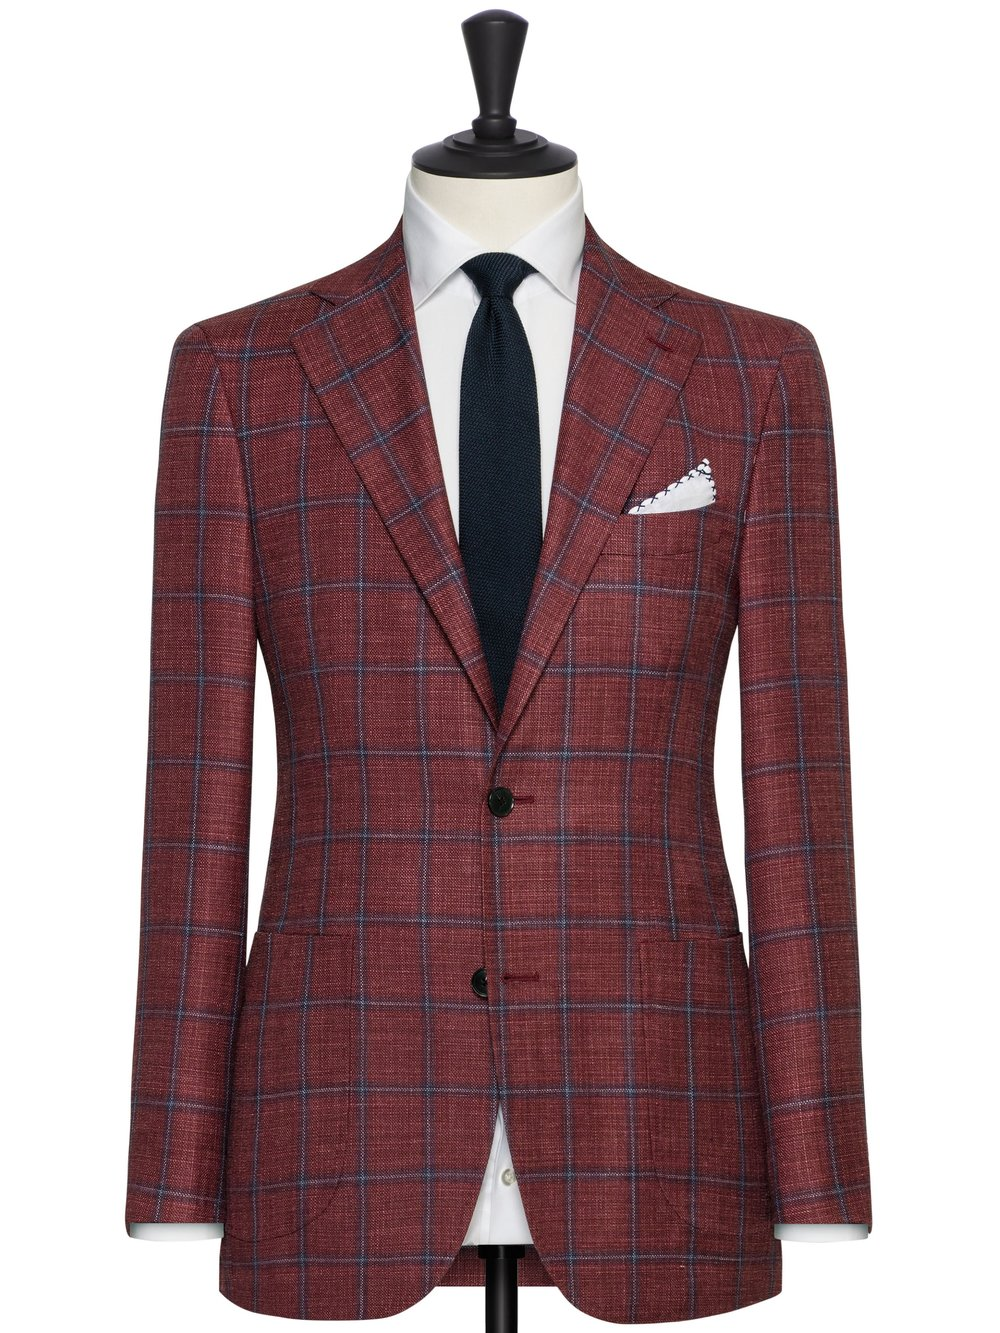 Summertime Tweed by Loro Piana. Wool/Silk/Linen Blend. 250 grams. Fabric Code: 8451